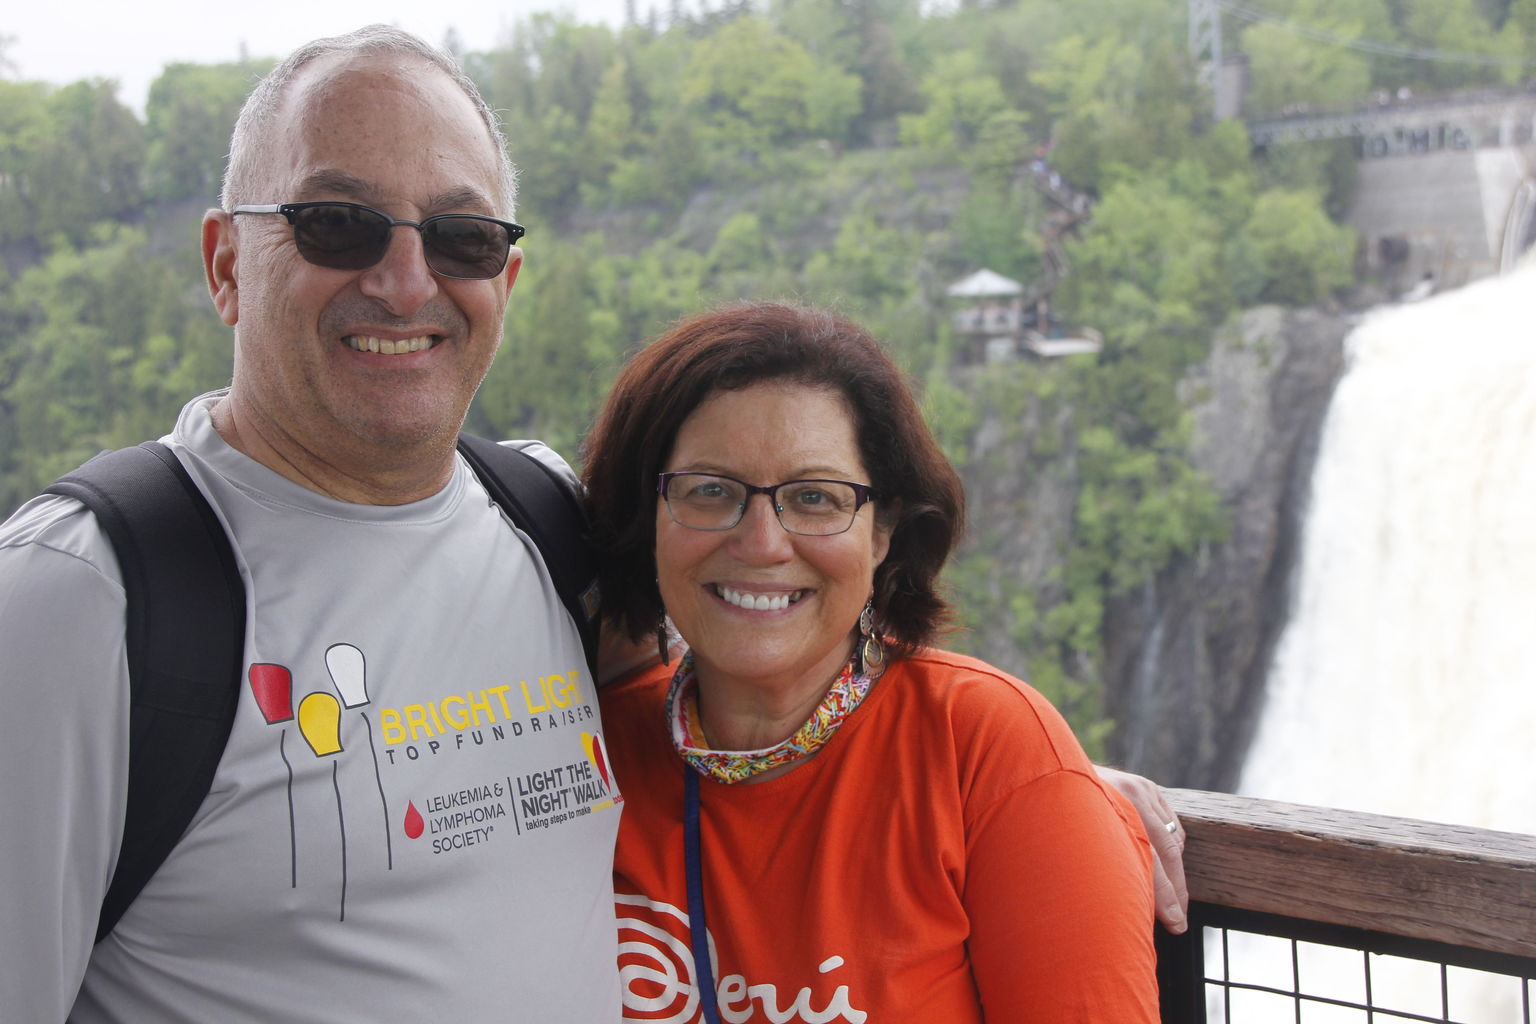 MORE PHOTOS, Montmorency Falls Bike Tour in Quebec